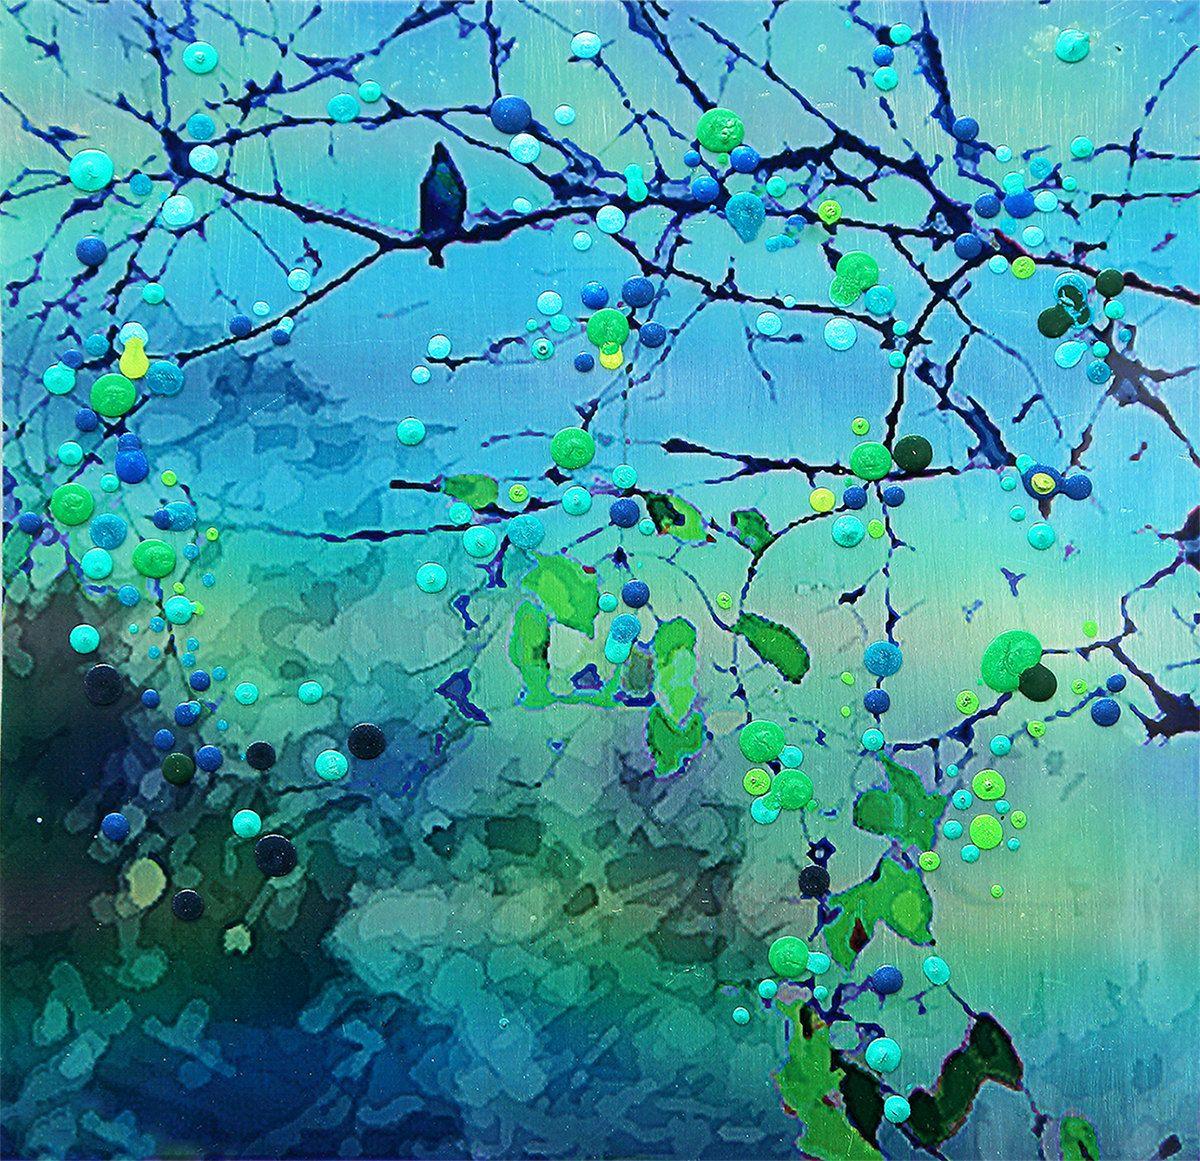 Bluebird - Morning Song - The promise of new beginnings.  Art work by Energy Artist Julia Watkins.